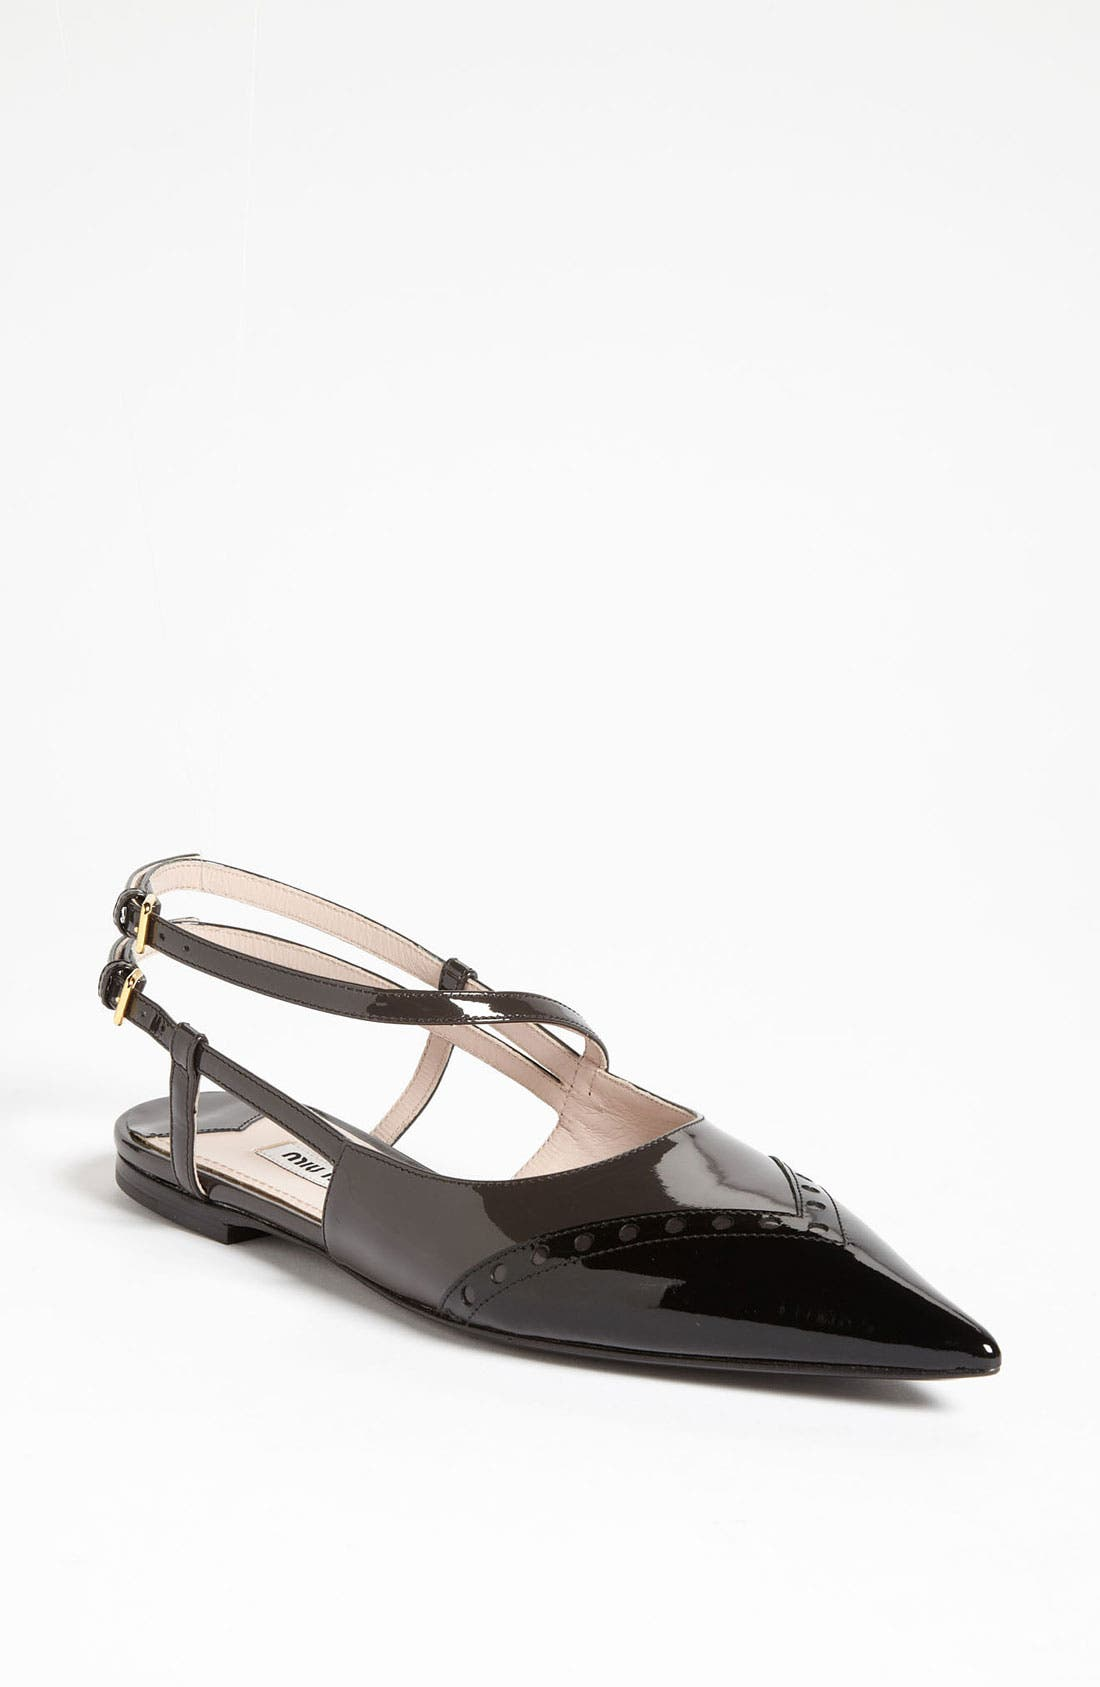 Alternate Image 1 Selected - Miu Miu Pointed Toe Ballet Flat (Nordstrom Exclusive)